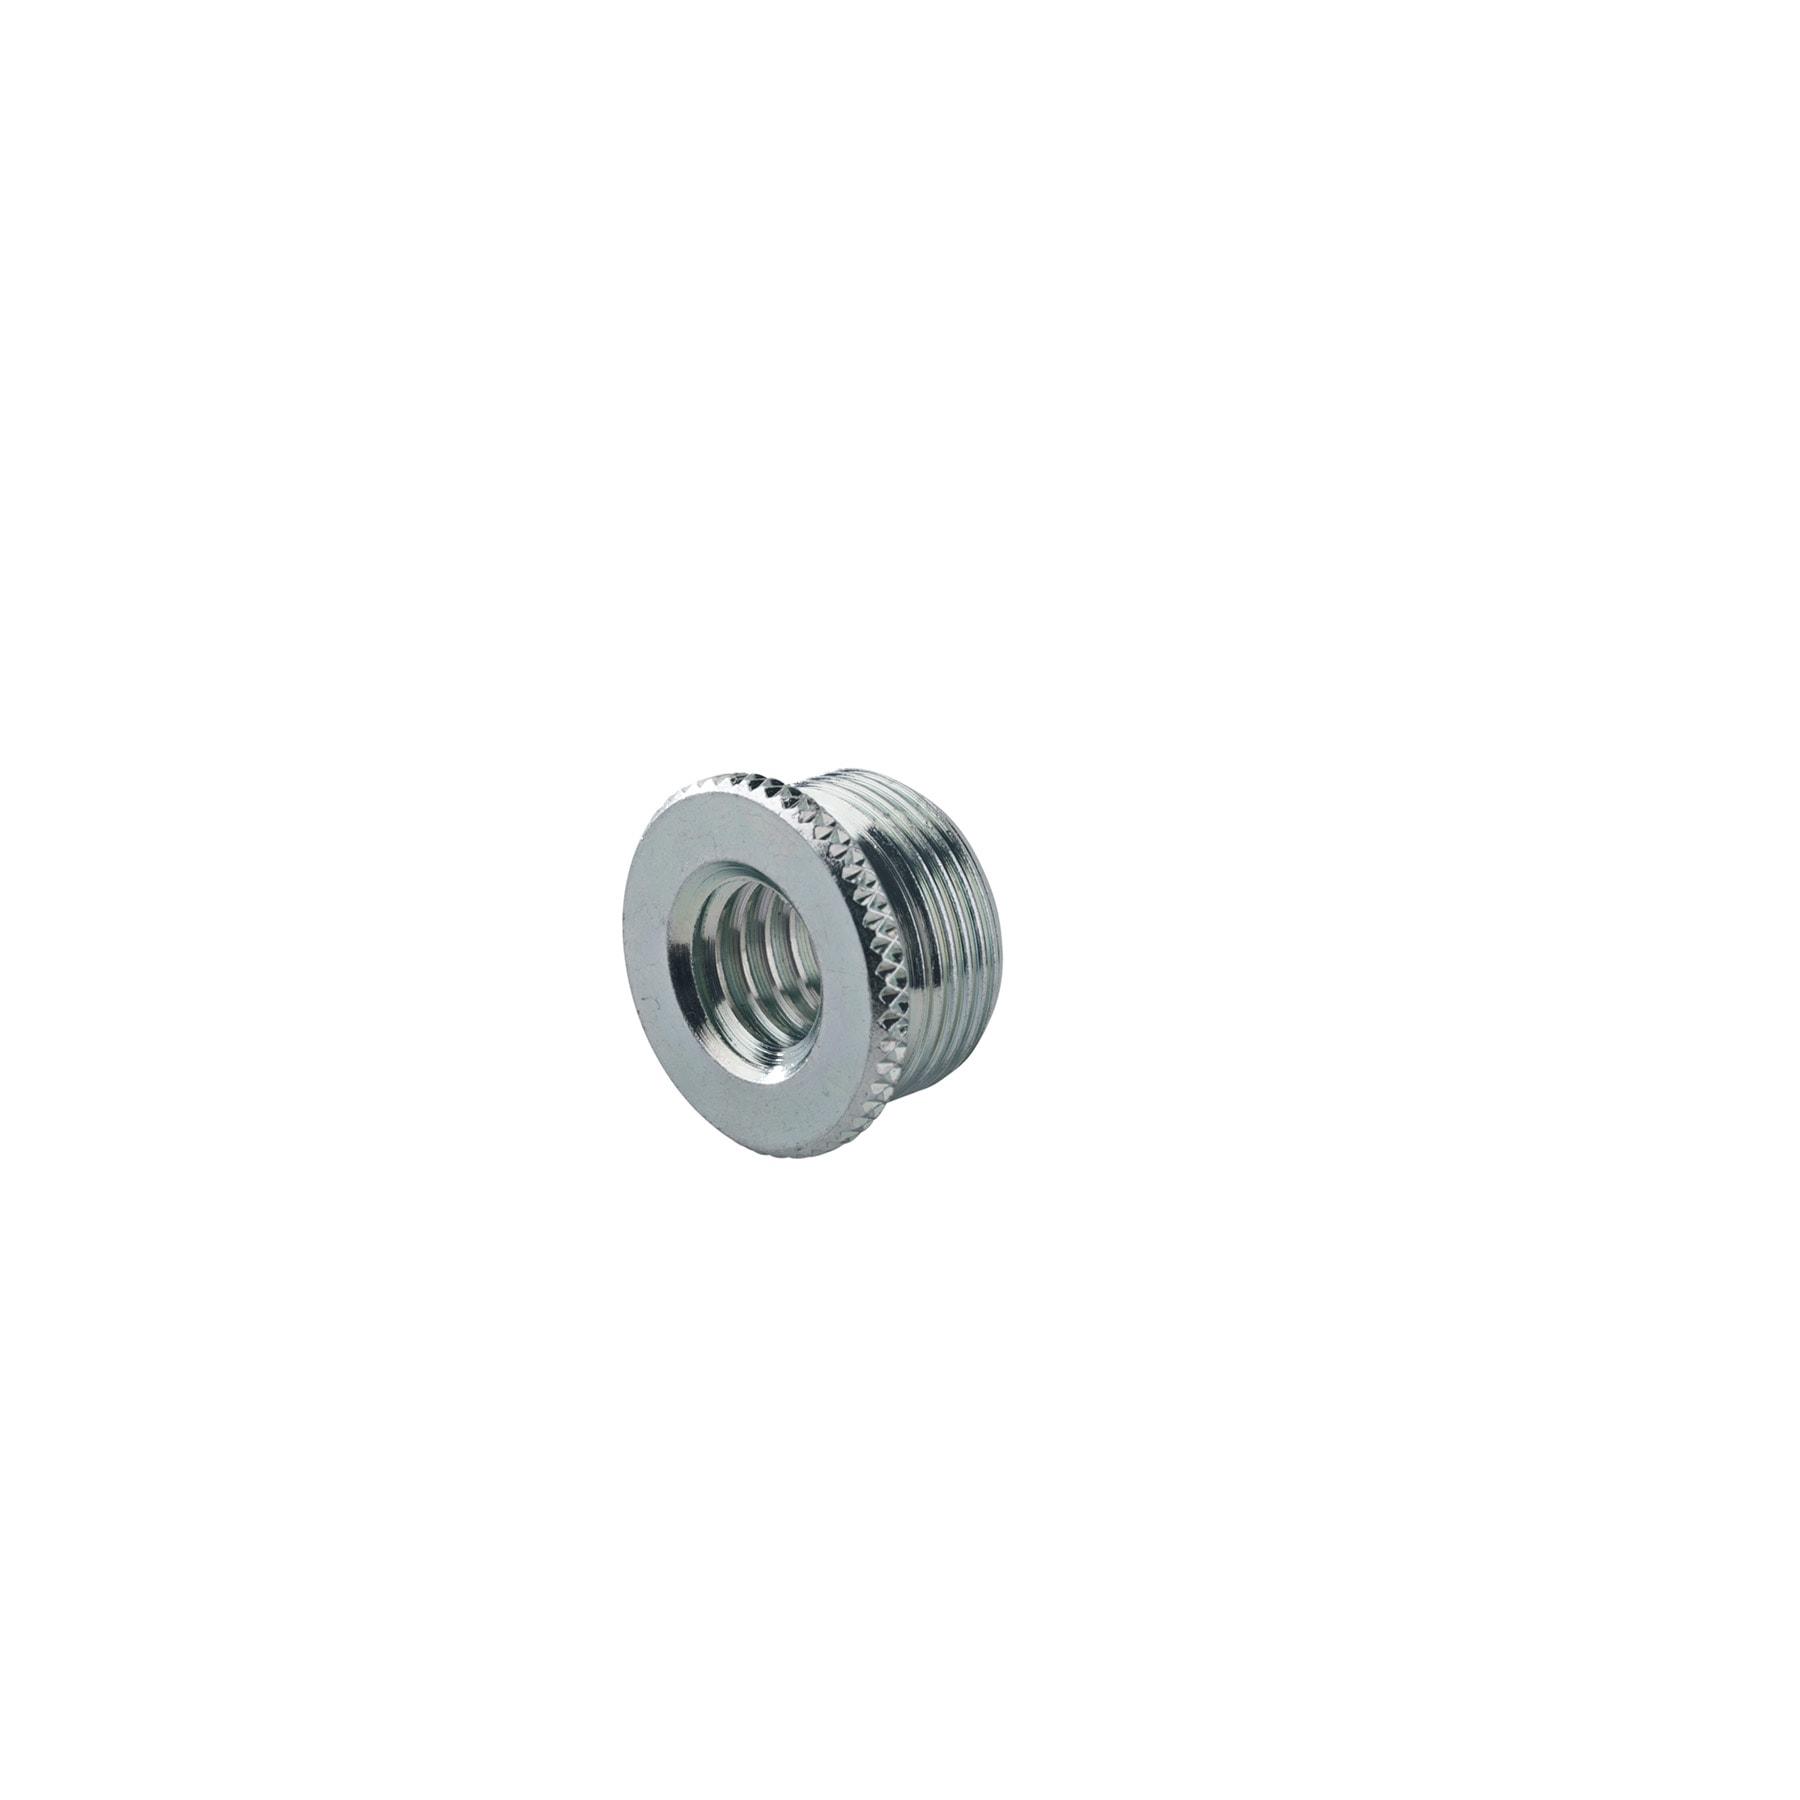 "KM21700-000-29 - thread adapter 3/8"""" female t hread,5/8"""" 27 gauge male tr"